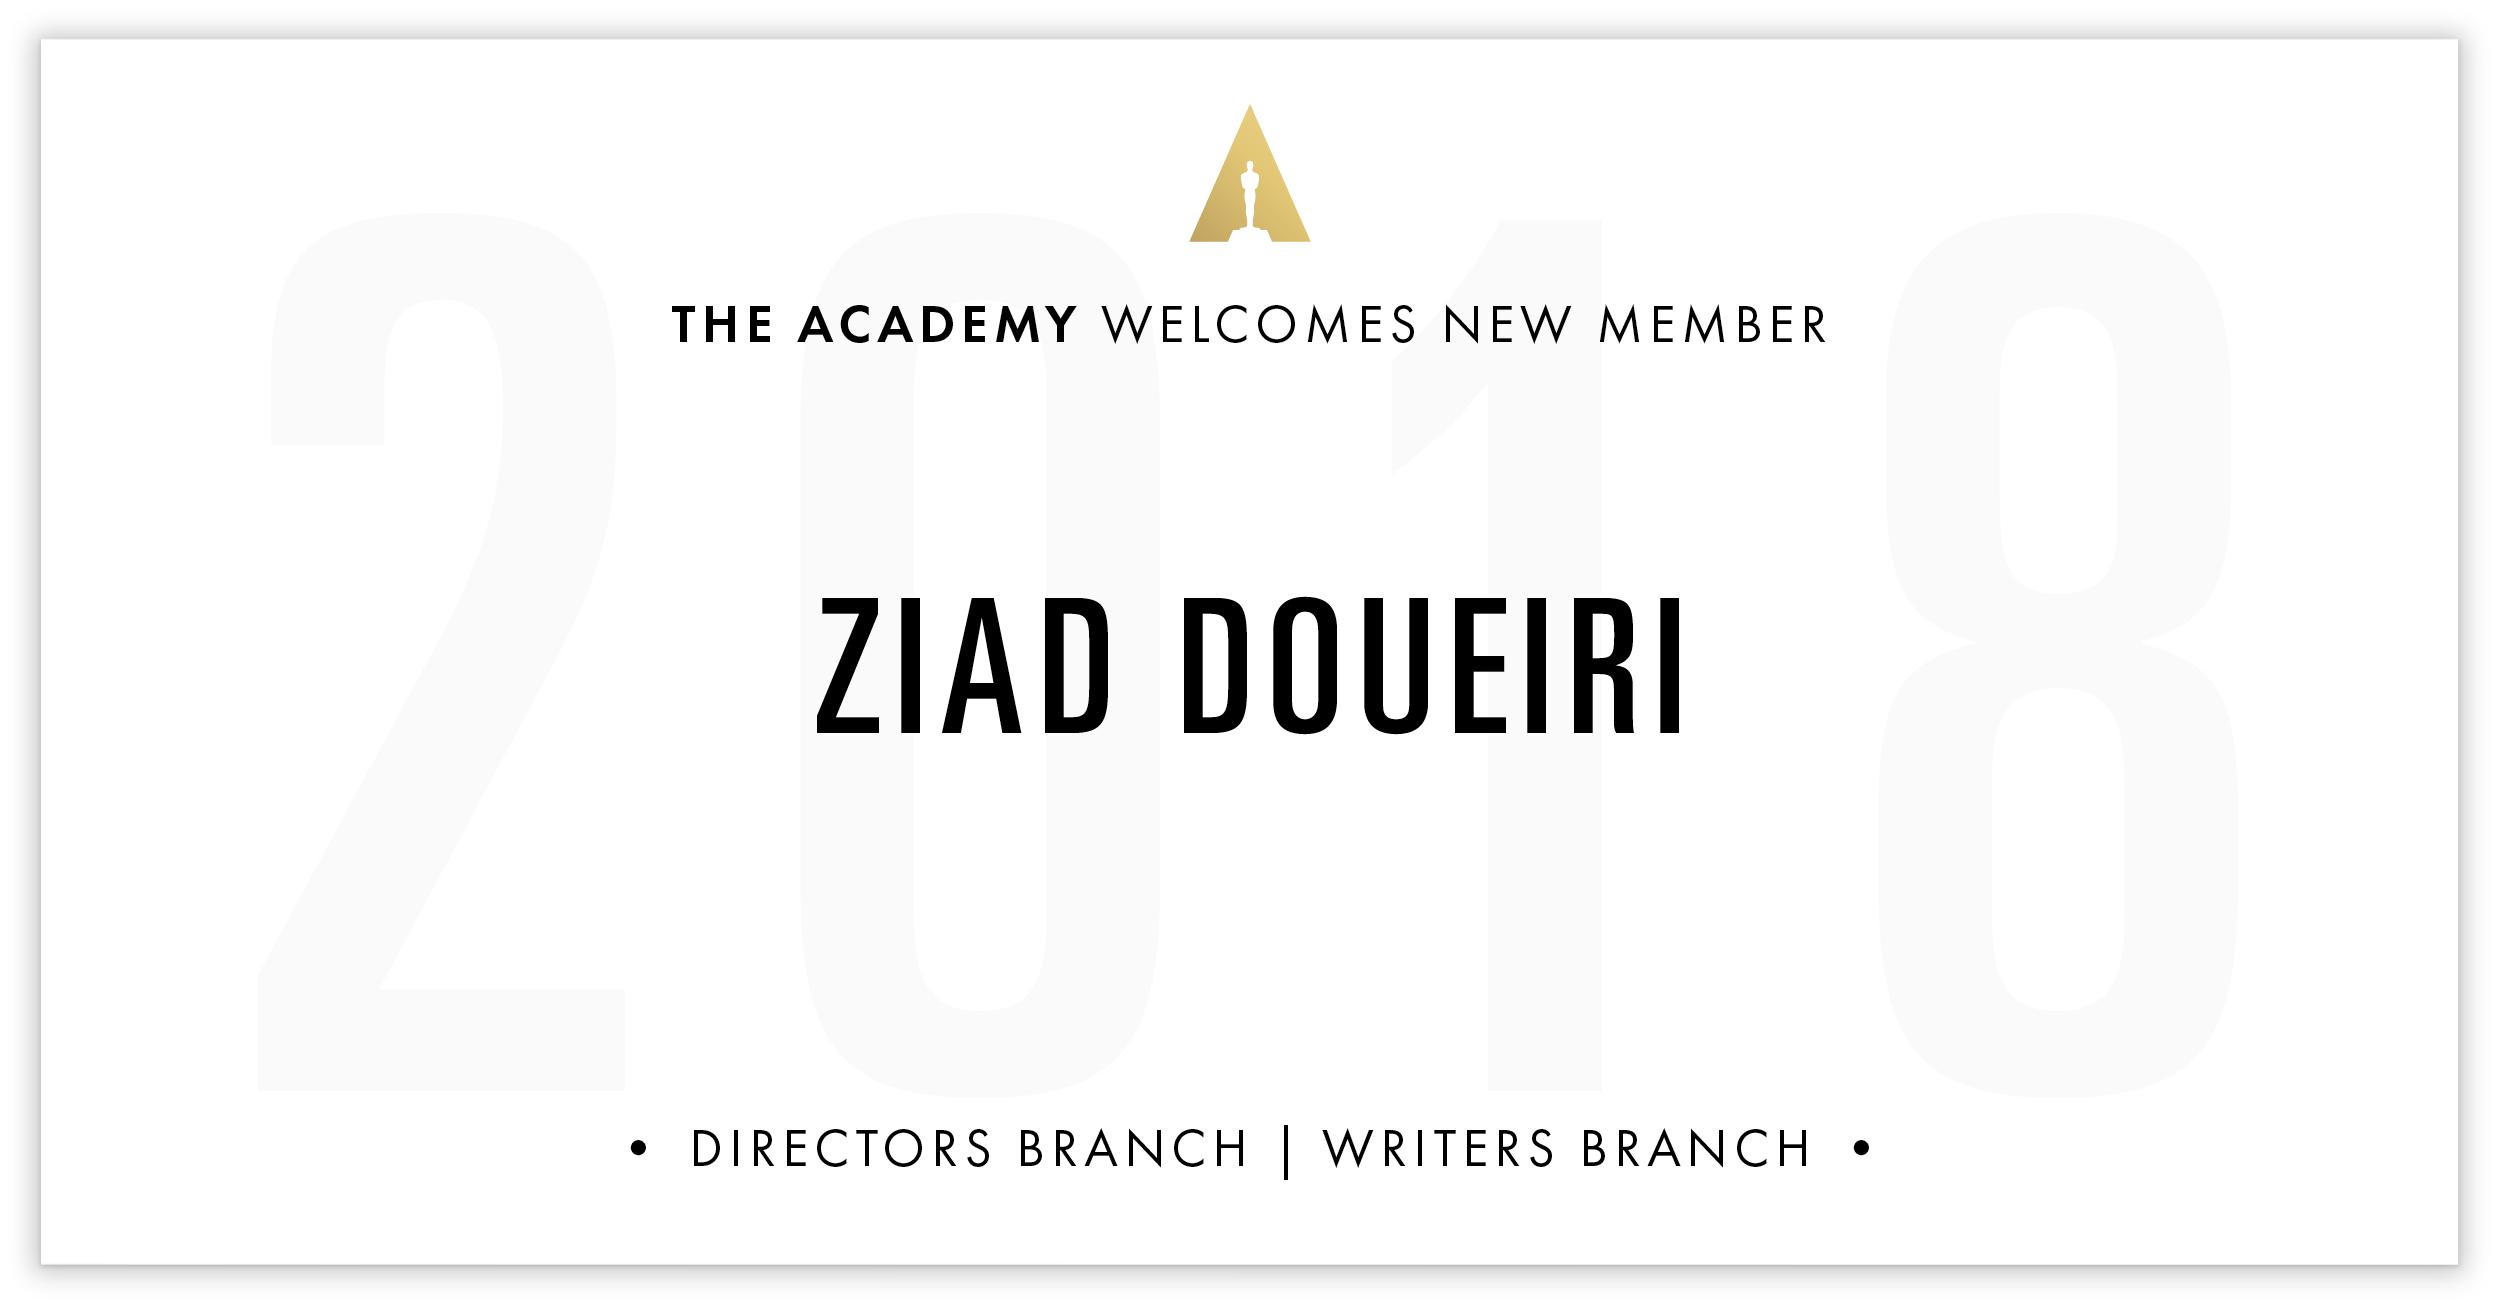 Ziad Doueiri is invited!